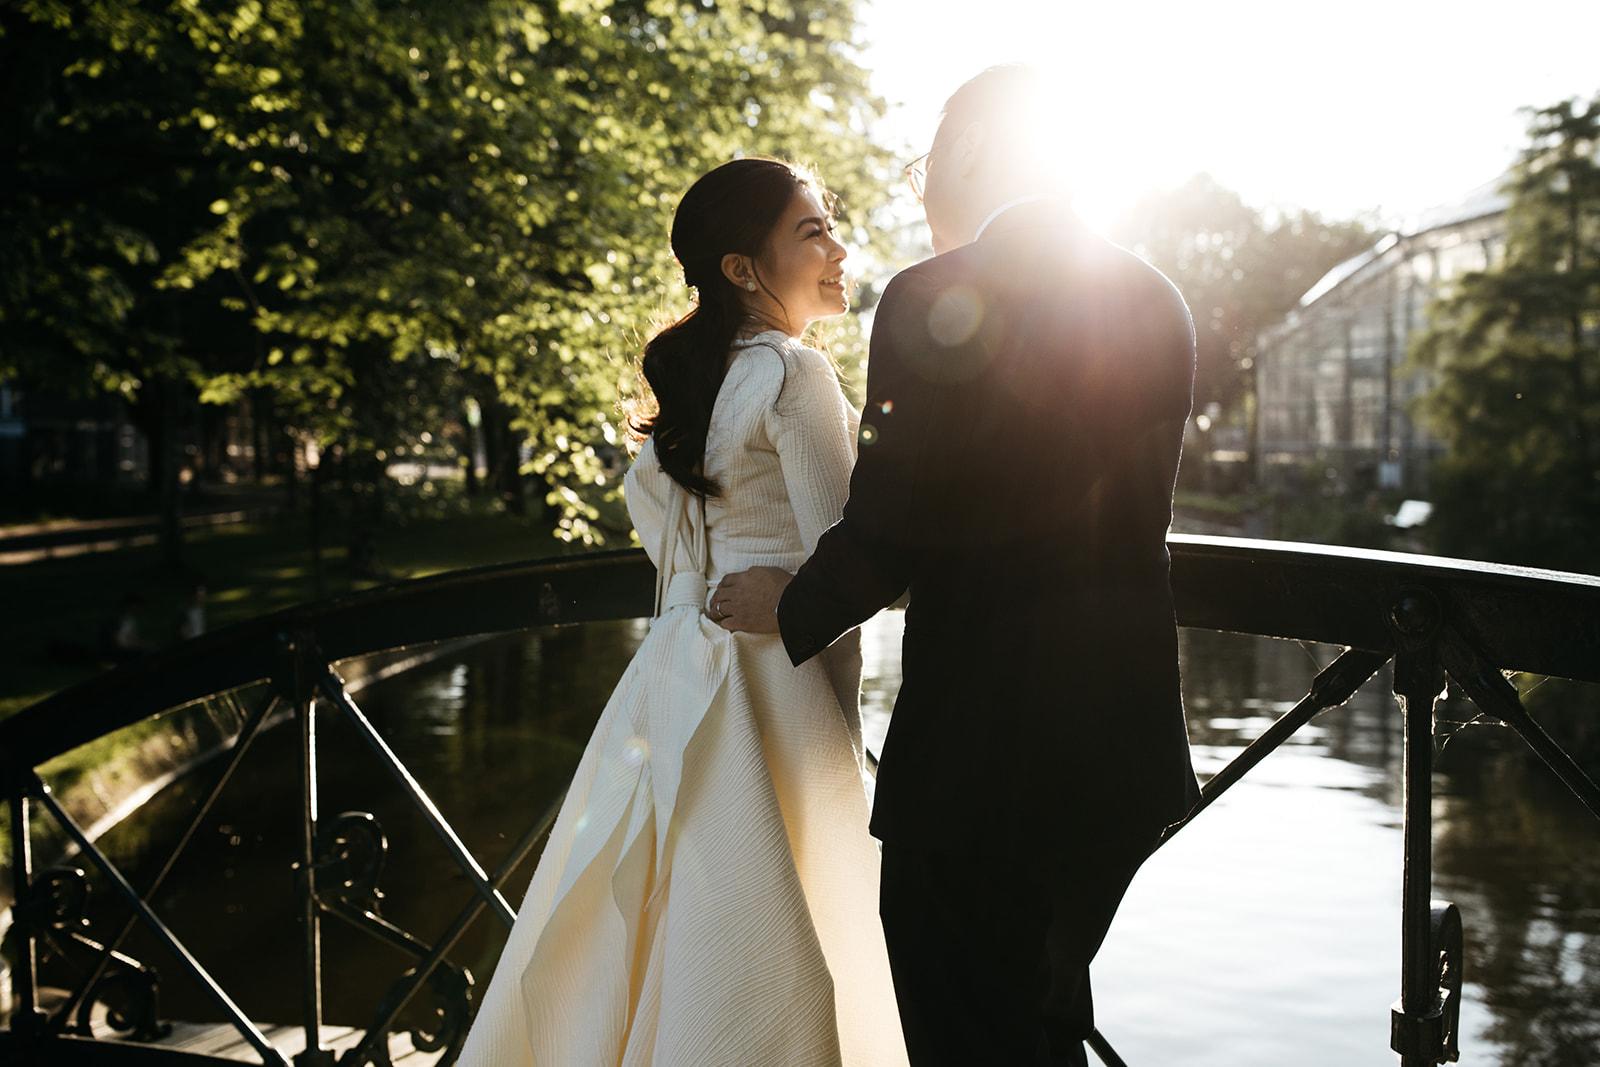 WiandaBongenPhotography-Cassandra_Ben-Wedding-440.jpg